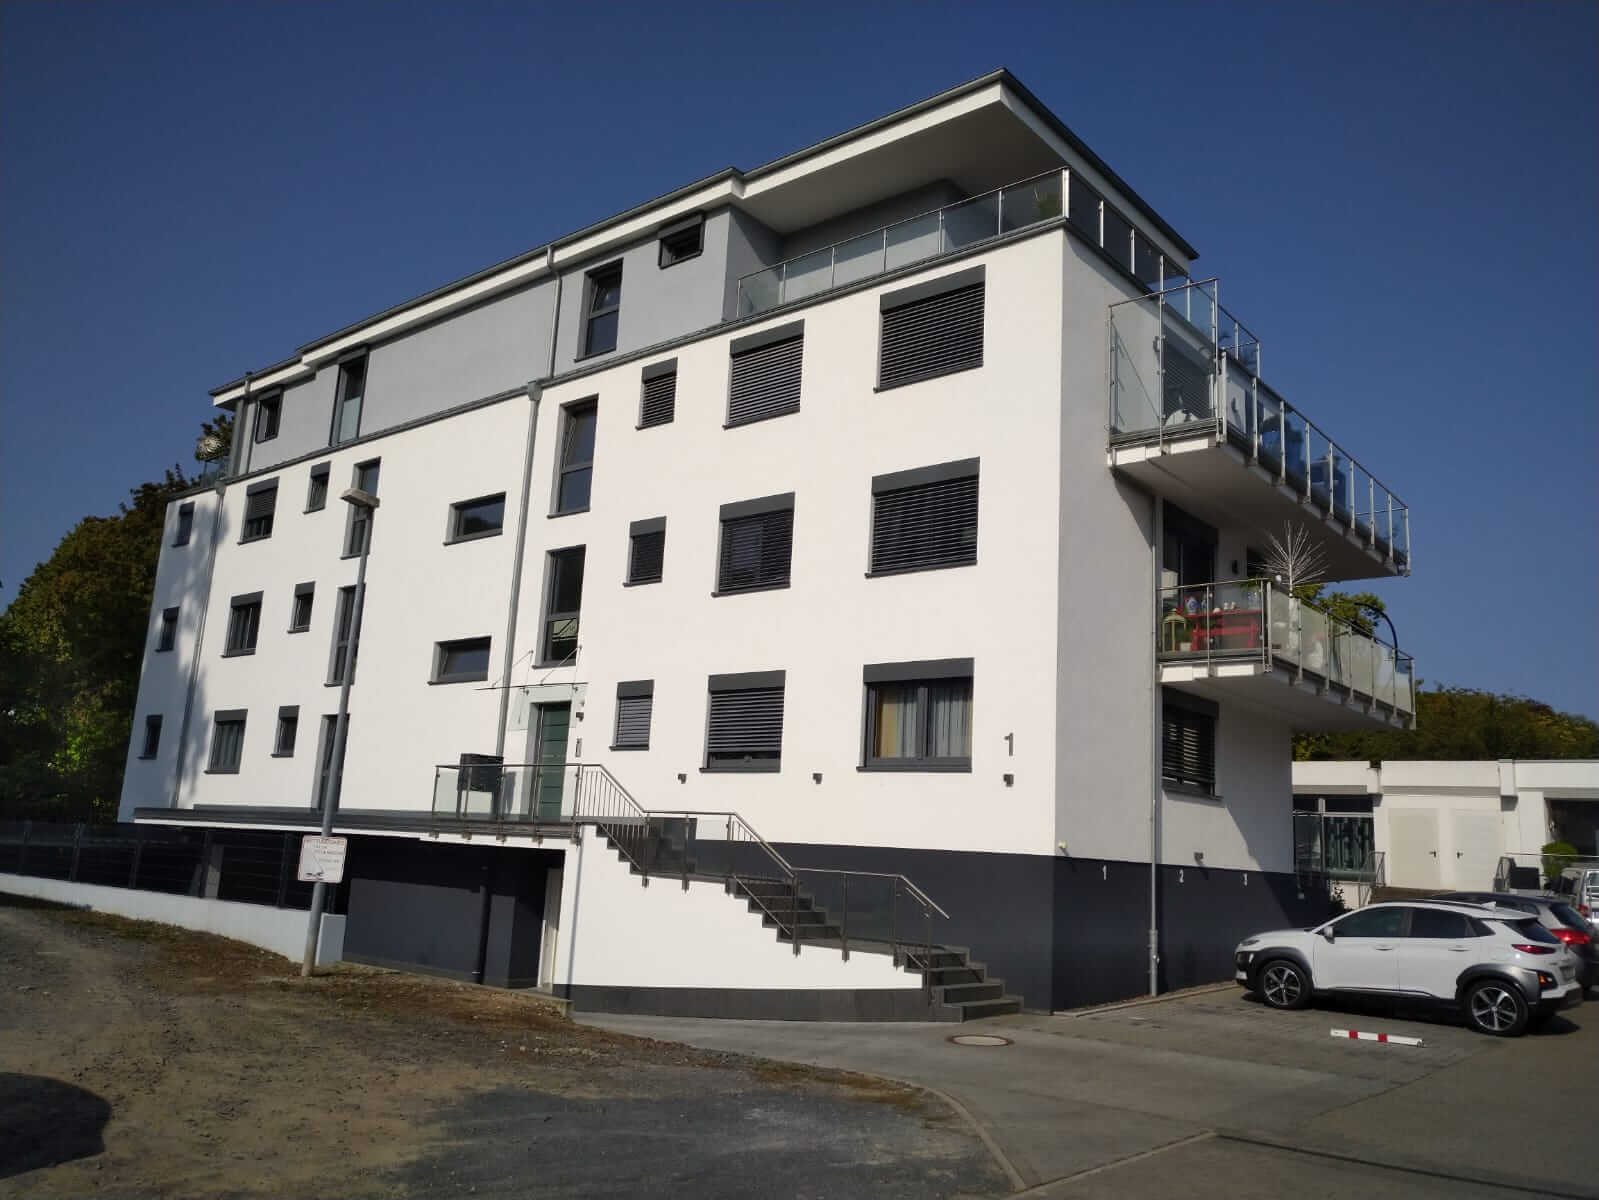 Mehrfamilienwohnhaus – Tempelgasse 1, Bad Breisig